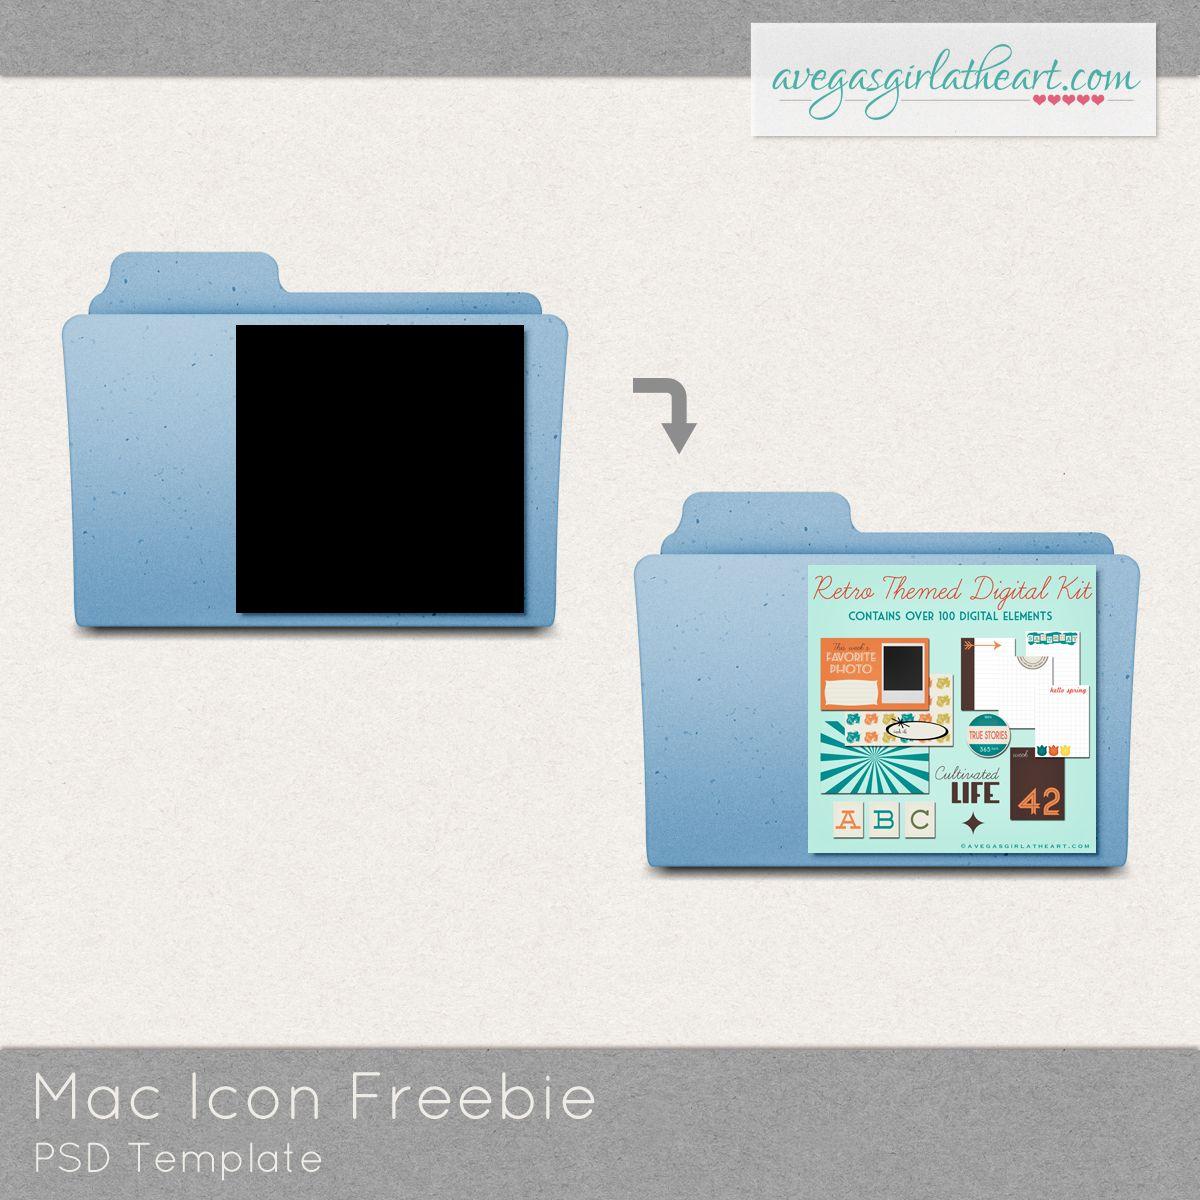 Freebie Mac Folder Icon Template For Organizing Digi Supplies